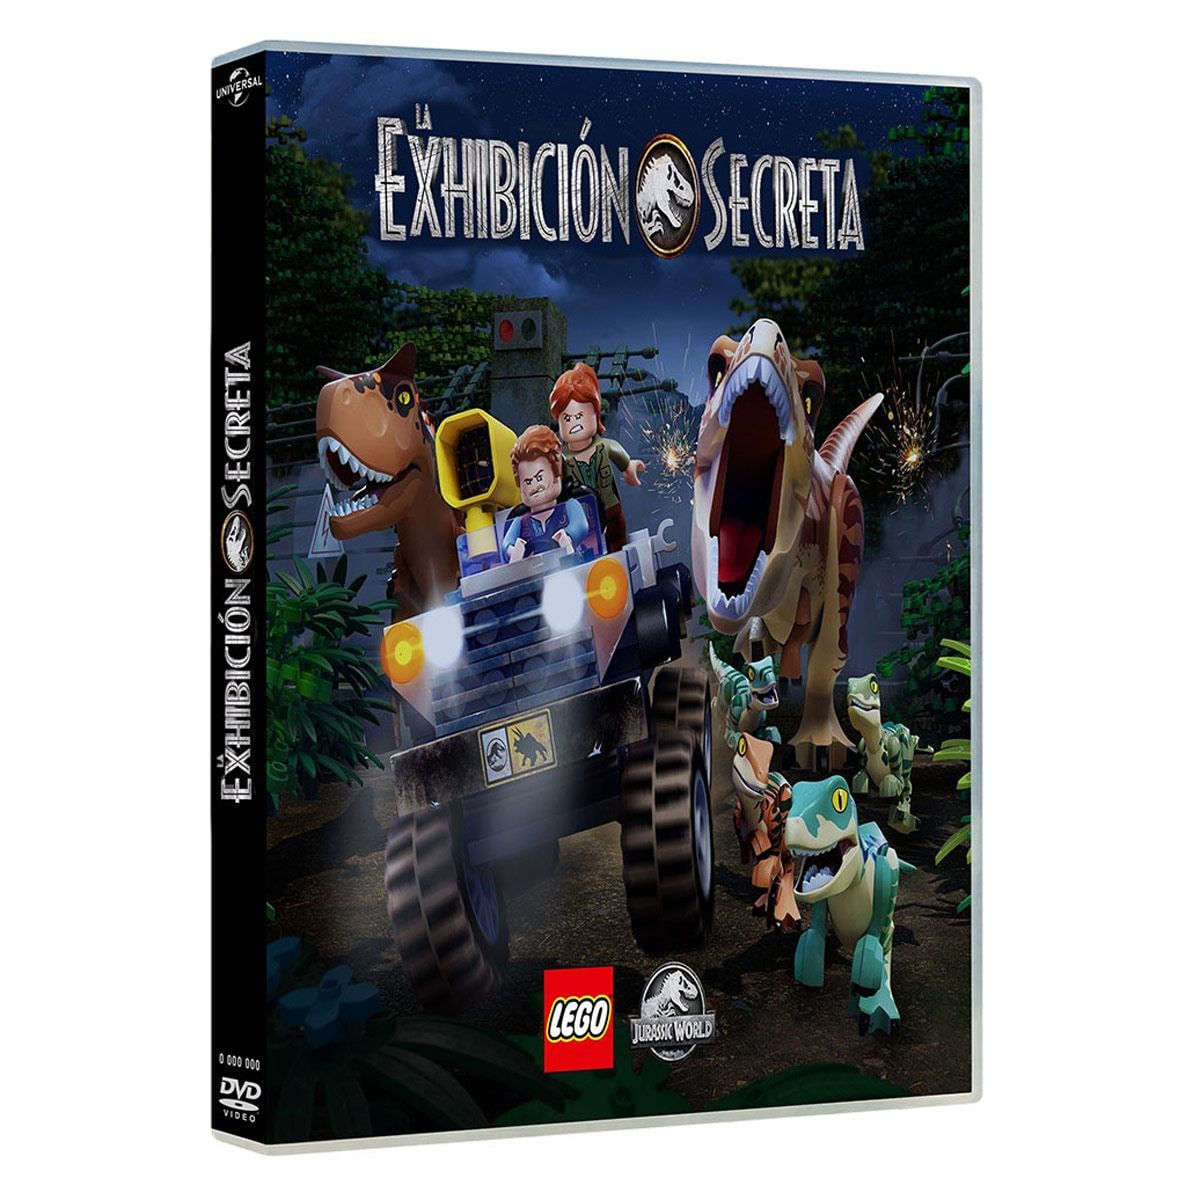 DVD Lego Jurassic World La Exhibición Secreta